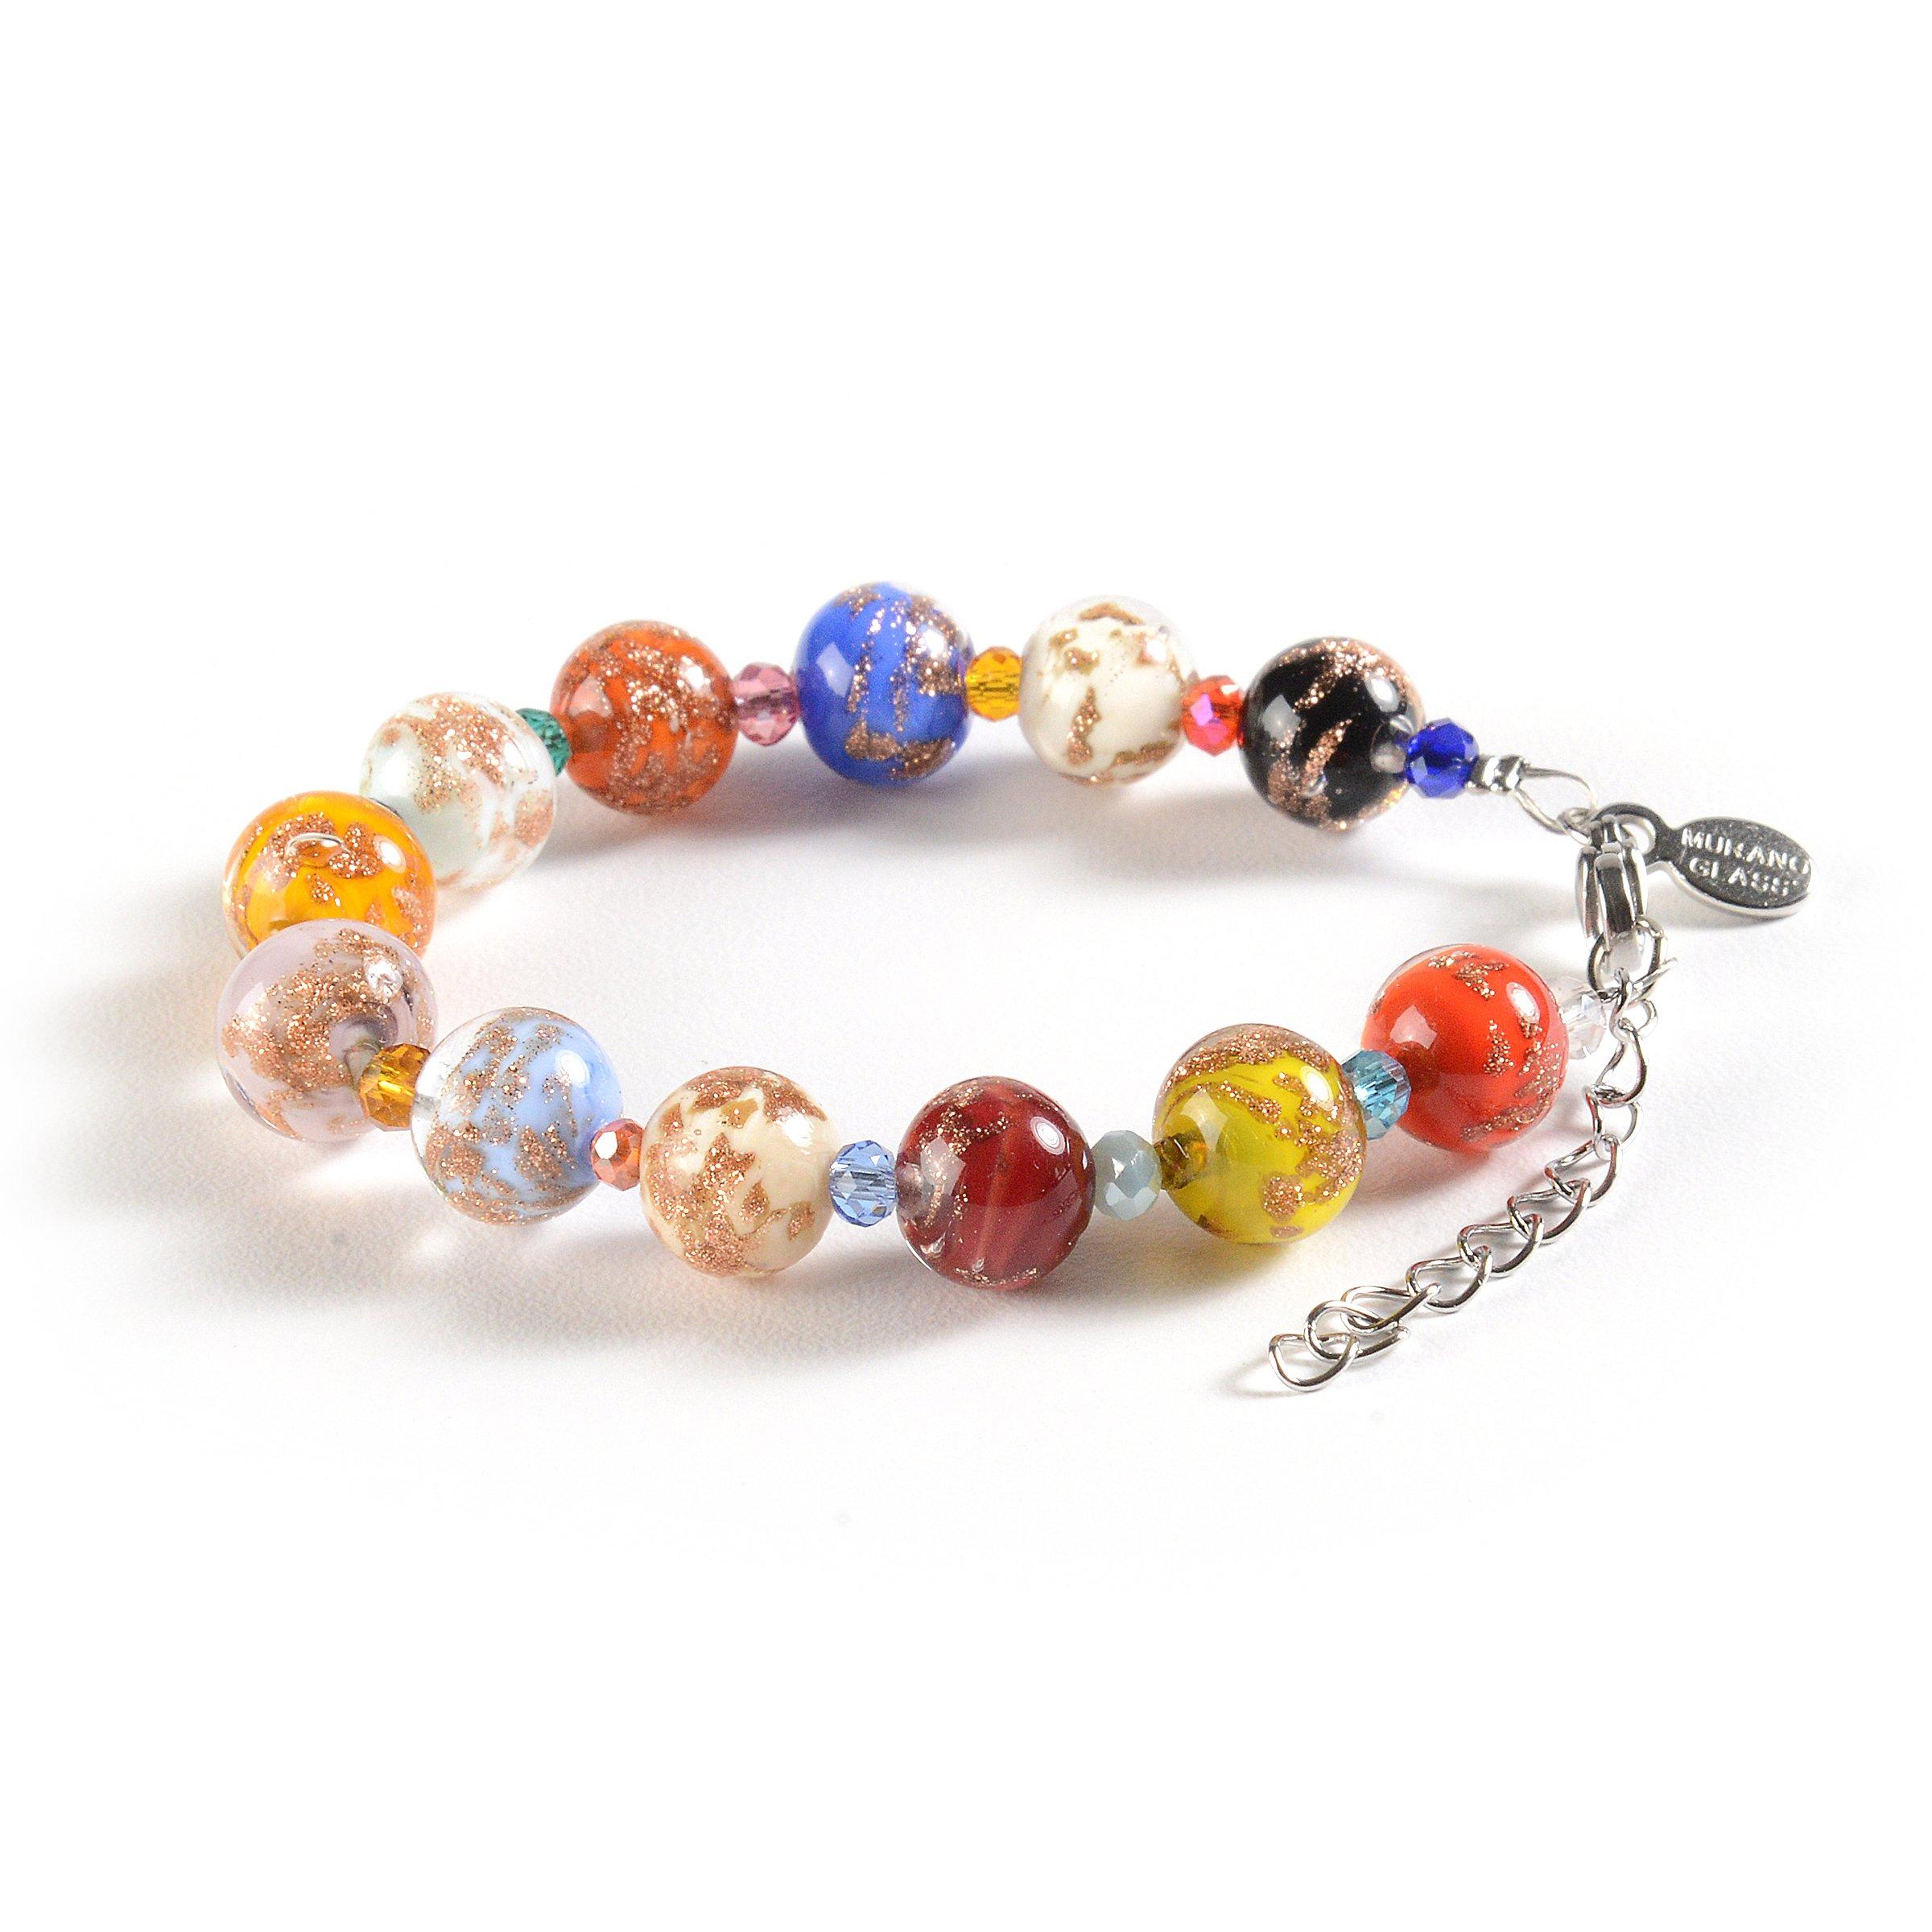 Murano Glass Jewelry, Handmade Vibrant Murano Glass Beads, Hypoallergenic Zamak Clasp, Each Murano Charm Bead is Unique, Colorful, and Exquisite - Murano Glass Bracelet for Women, Imported by EMBRACE LA GRANDE VITA (Image #1)